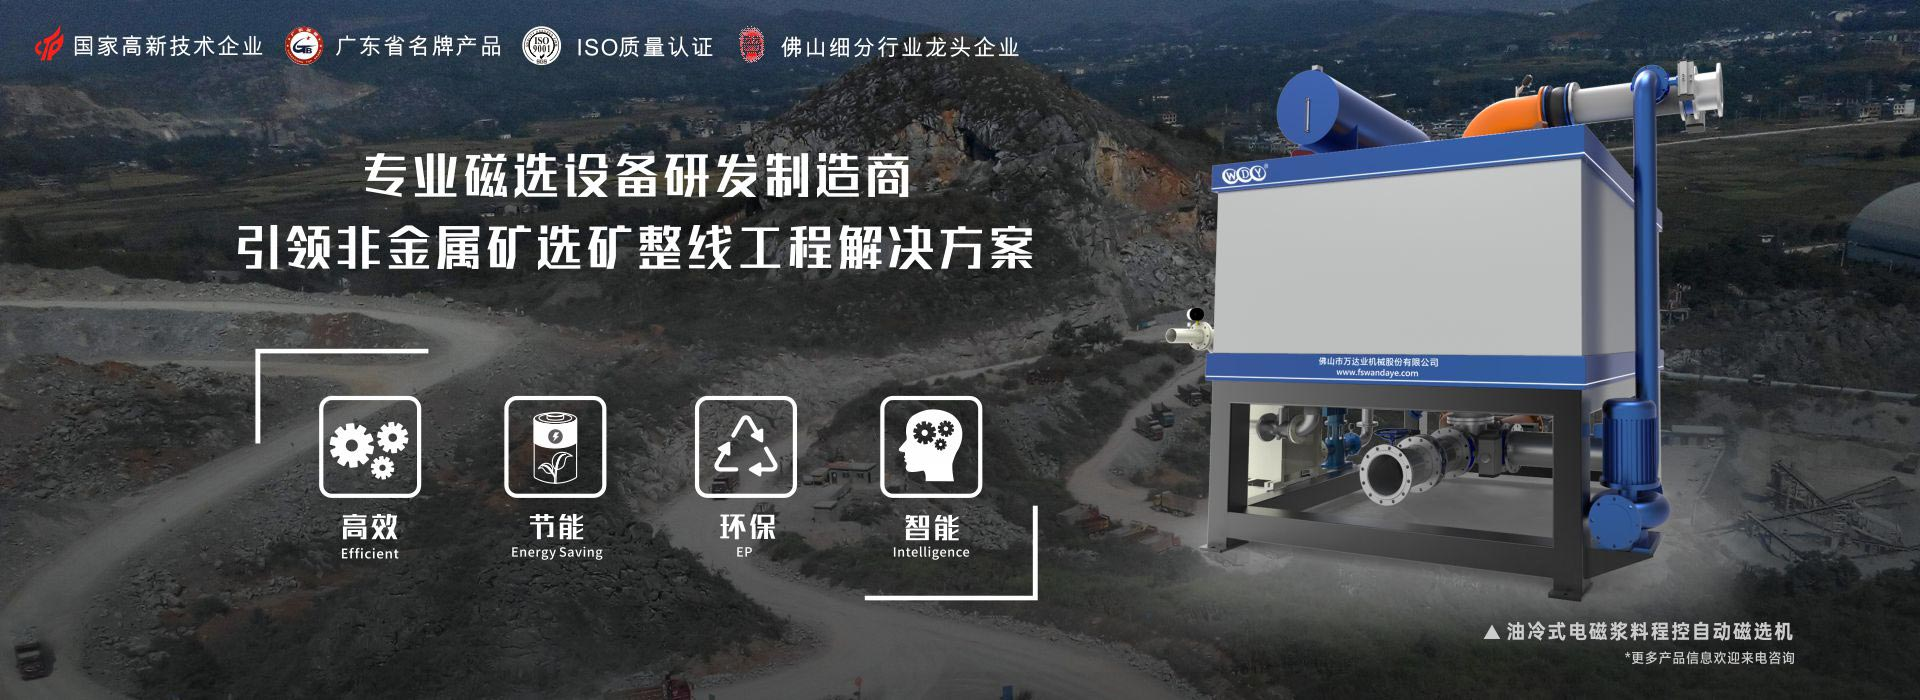 s10英雄联meng下zhu平台产品推荐:油冷电磁浆料自动磁xuan机